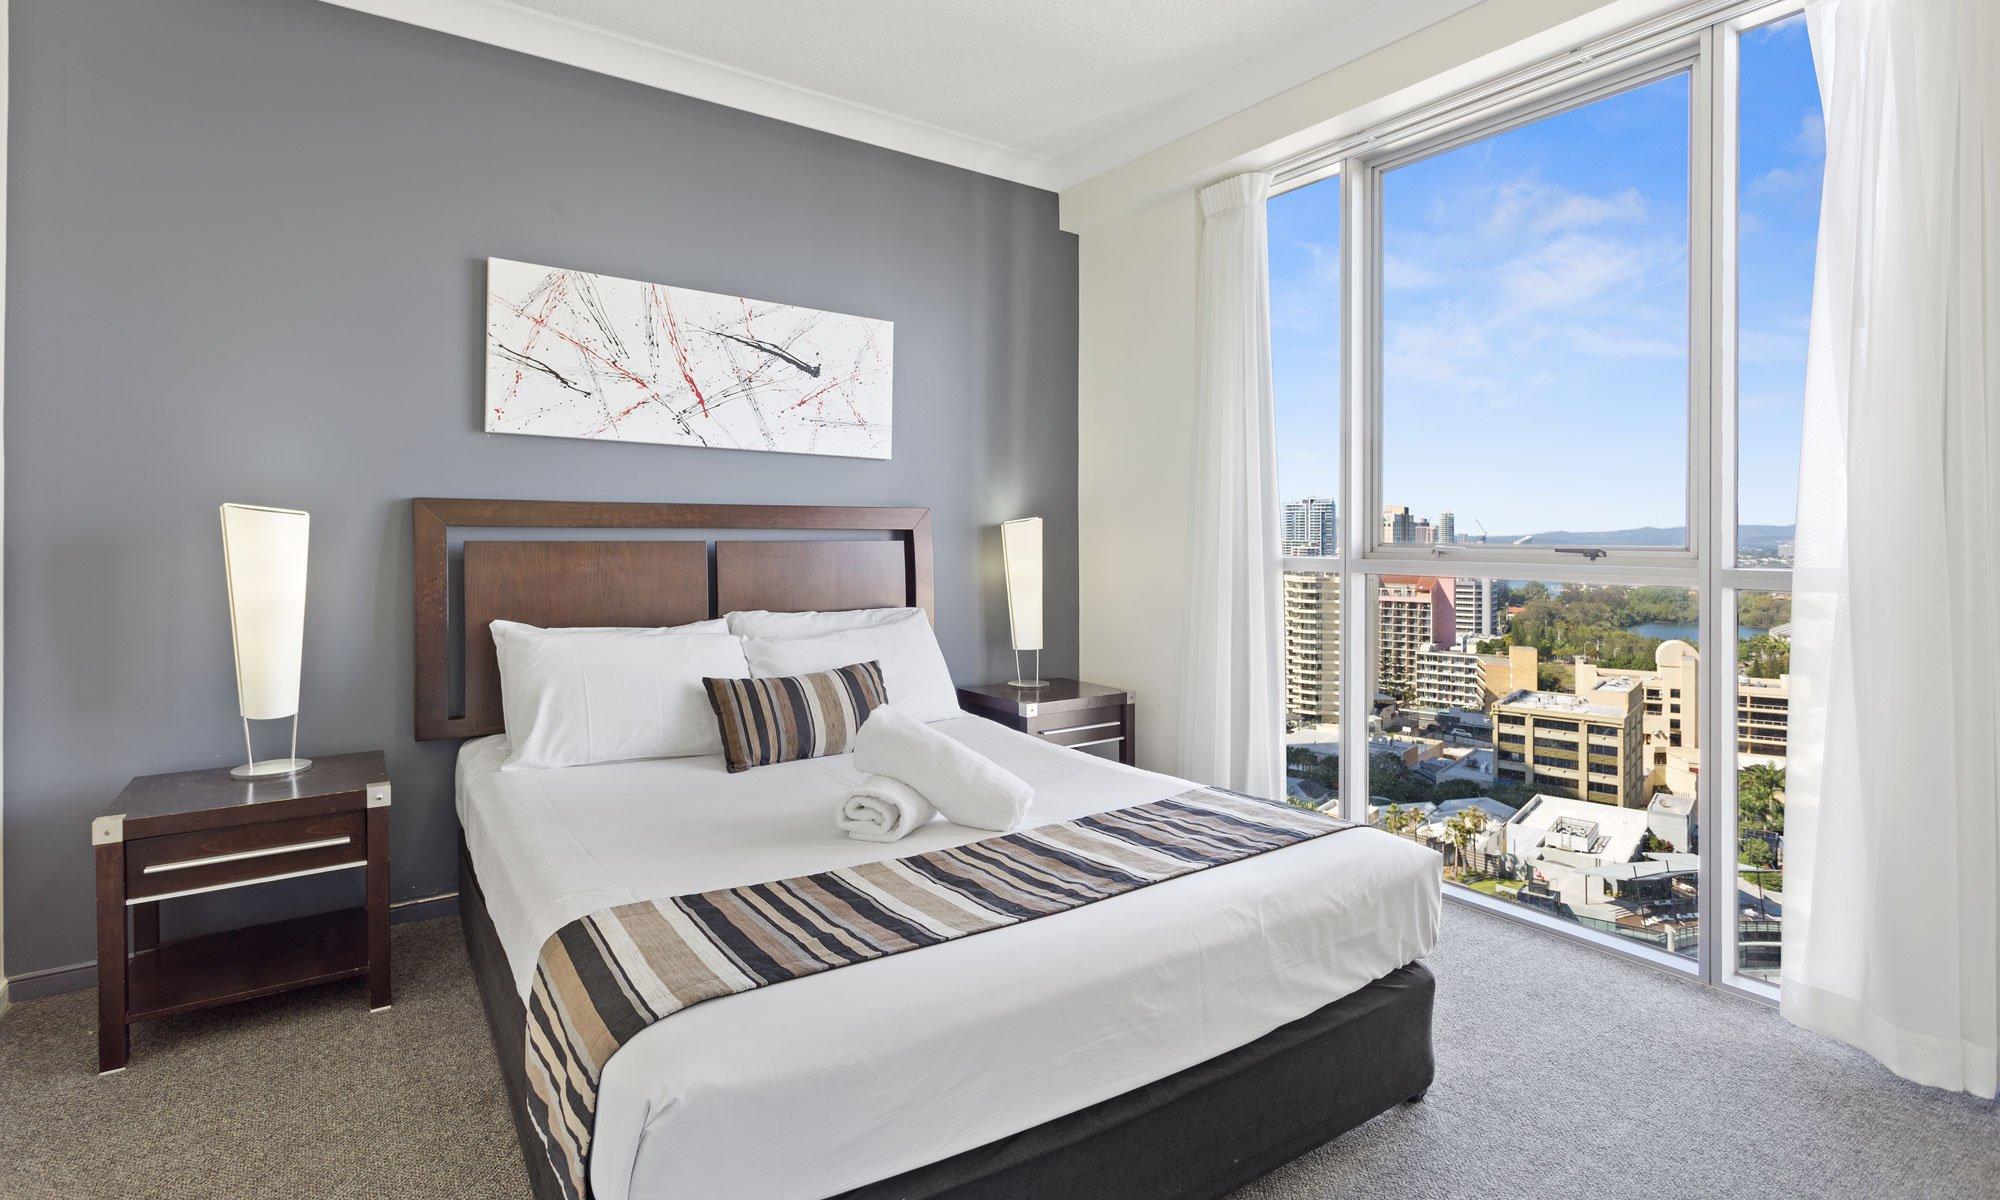 Gold Coast real estate for sale Chevron Renaissance 1171 main bedroom